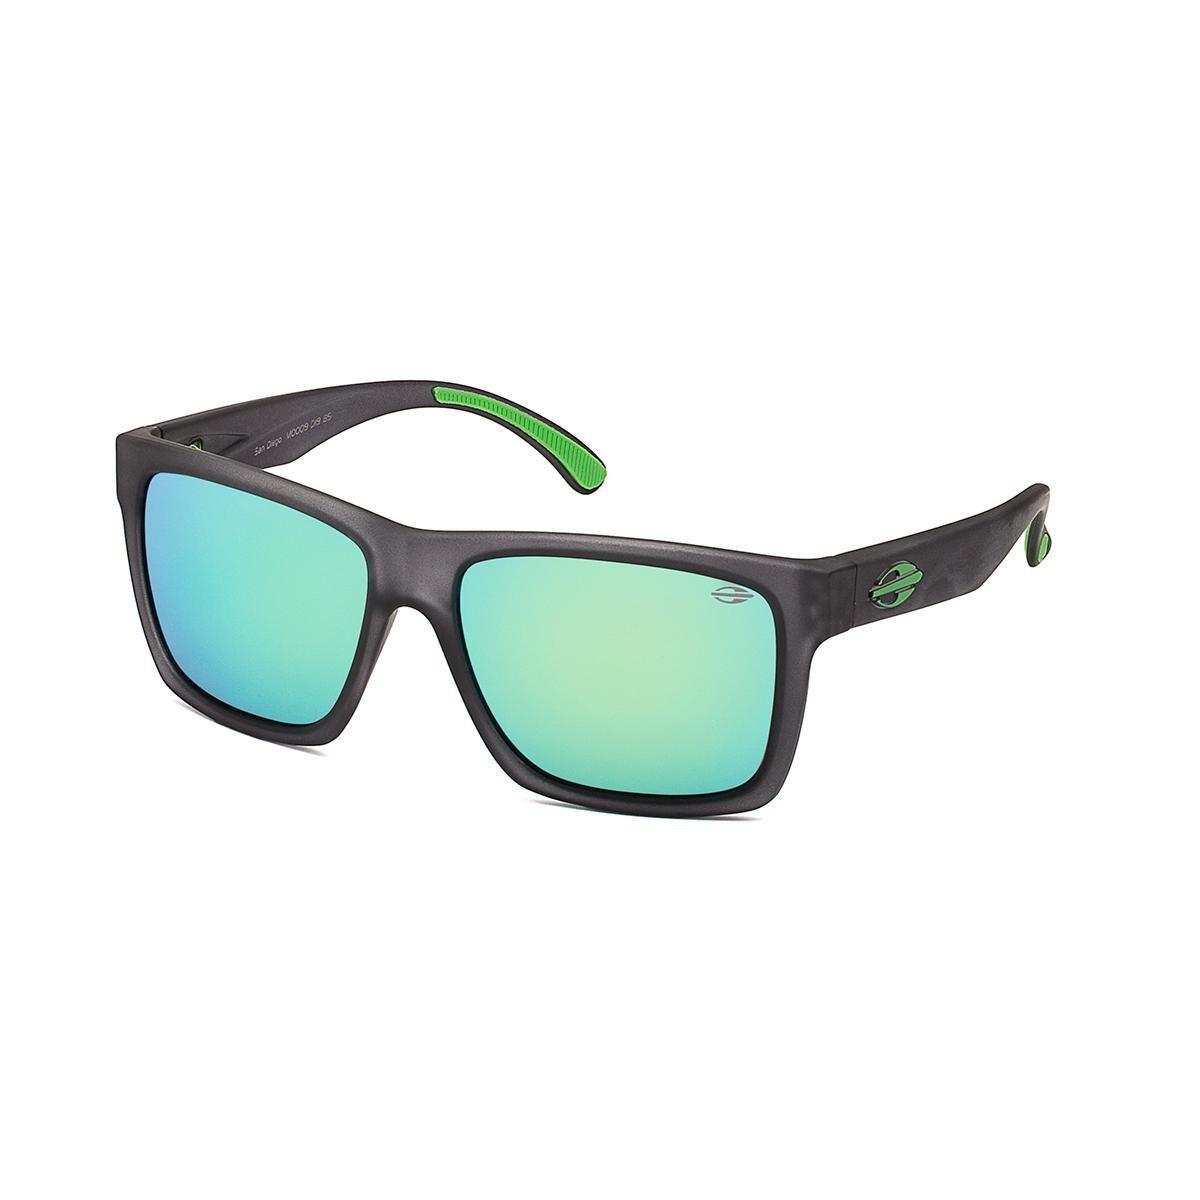 82f4cca4017c7 Oculos Sol Mormaii San Diego - Chumbo - Compre Agora